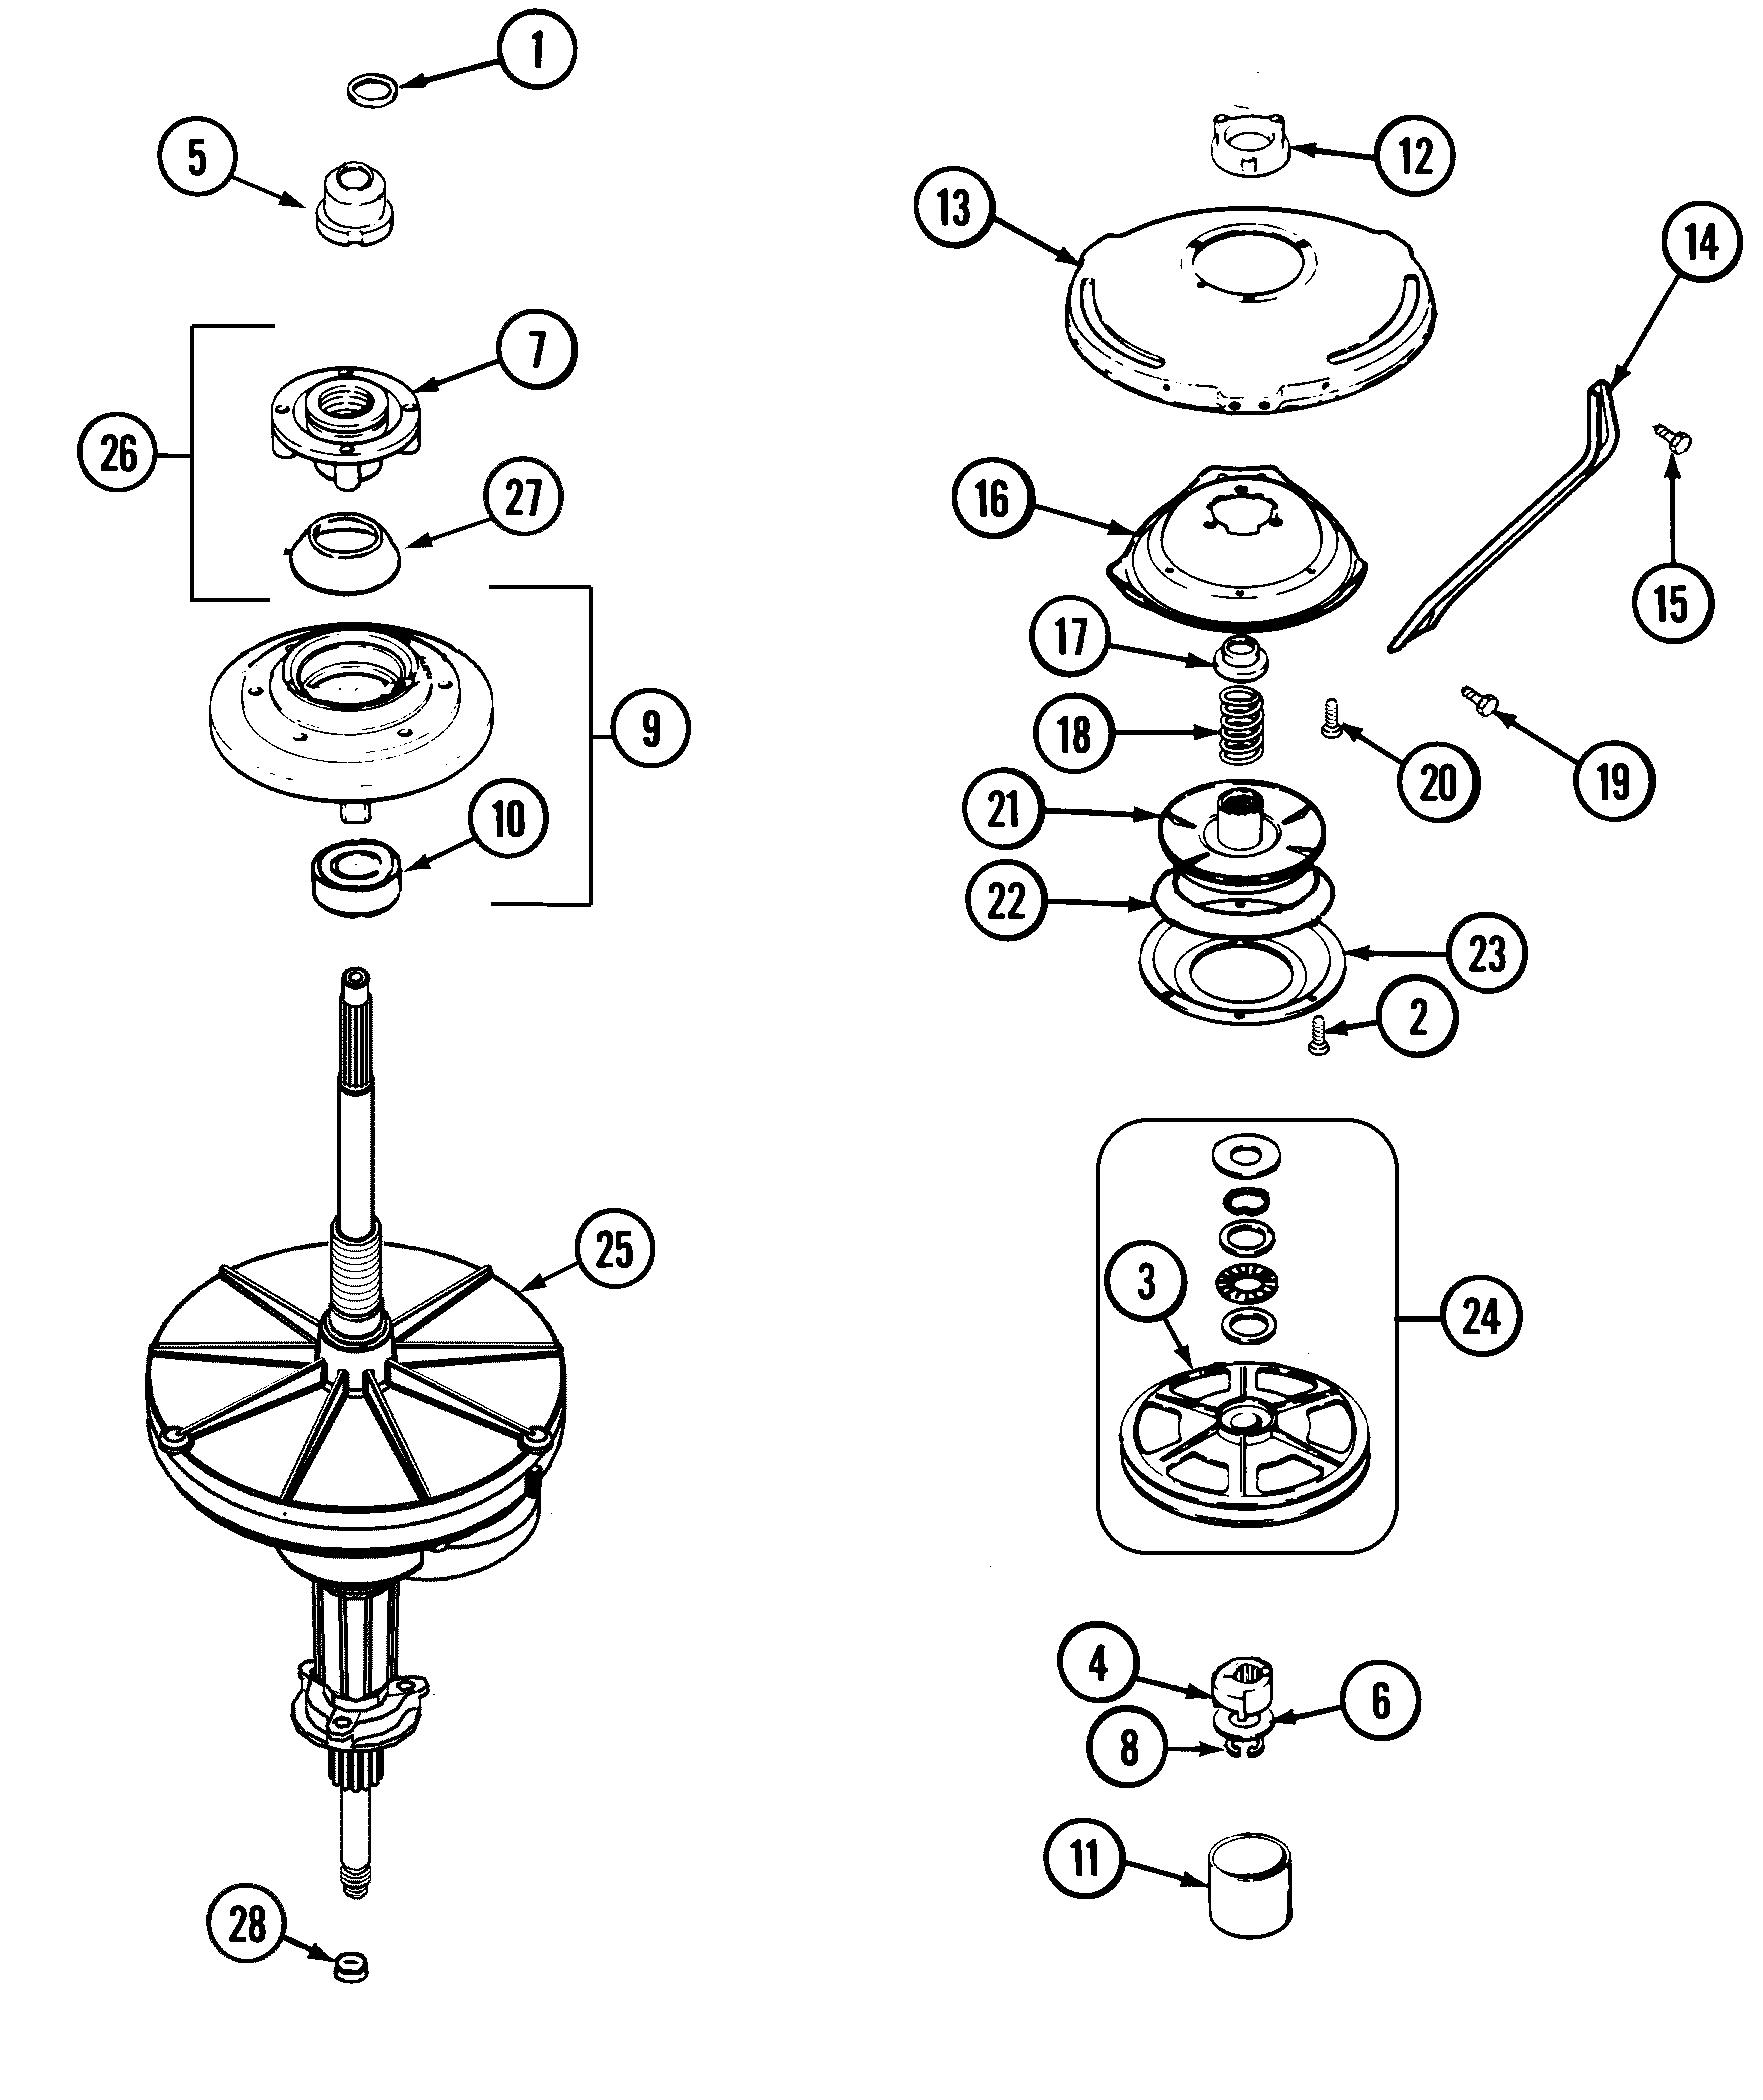 hight resolution of maytag pav2200aww transmission diagram